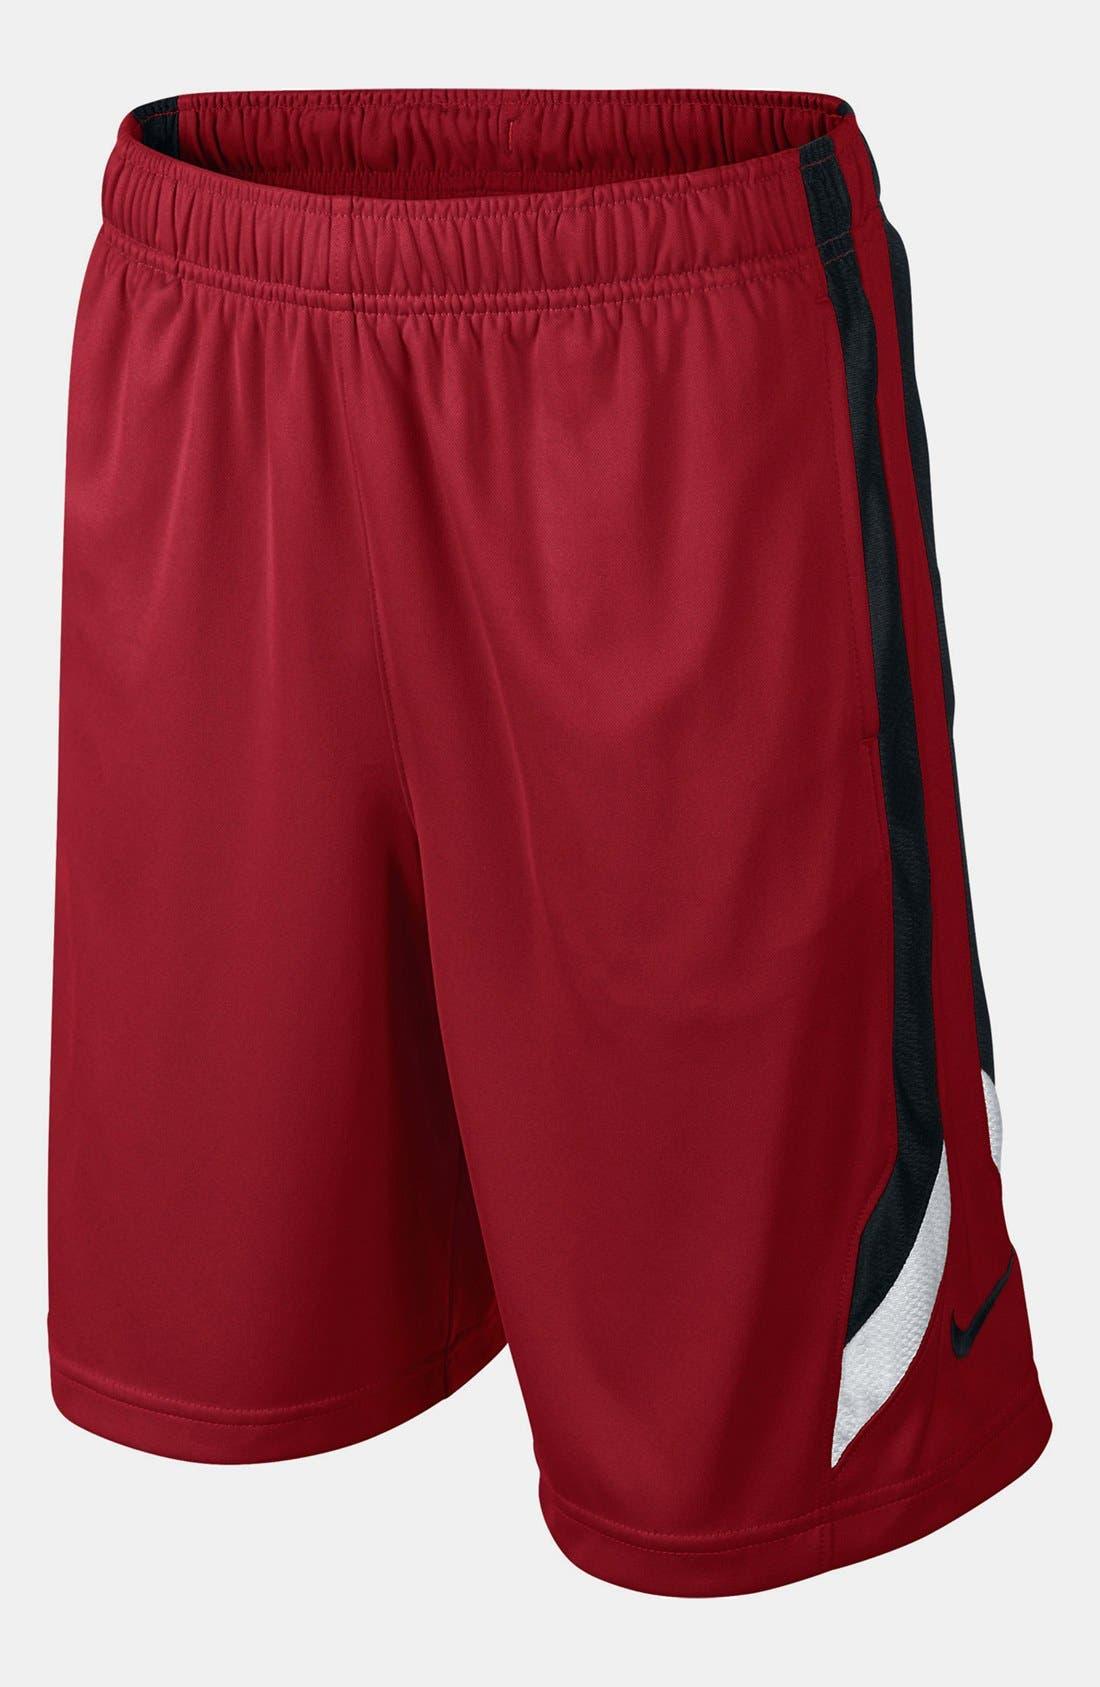 Alternate Image 1 Selected - Nike 'Super Fast' Dri-FIT Basketball Shorts (Big Boys)